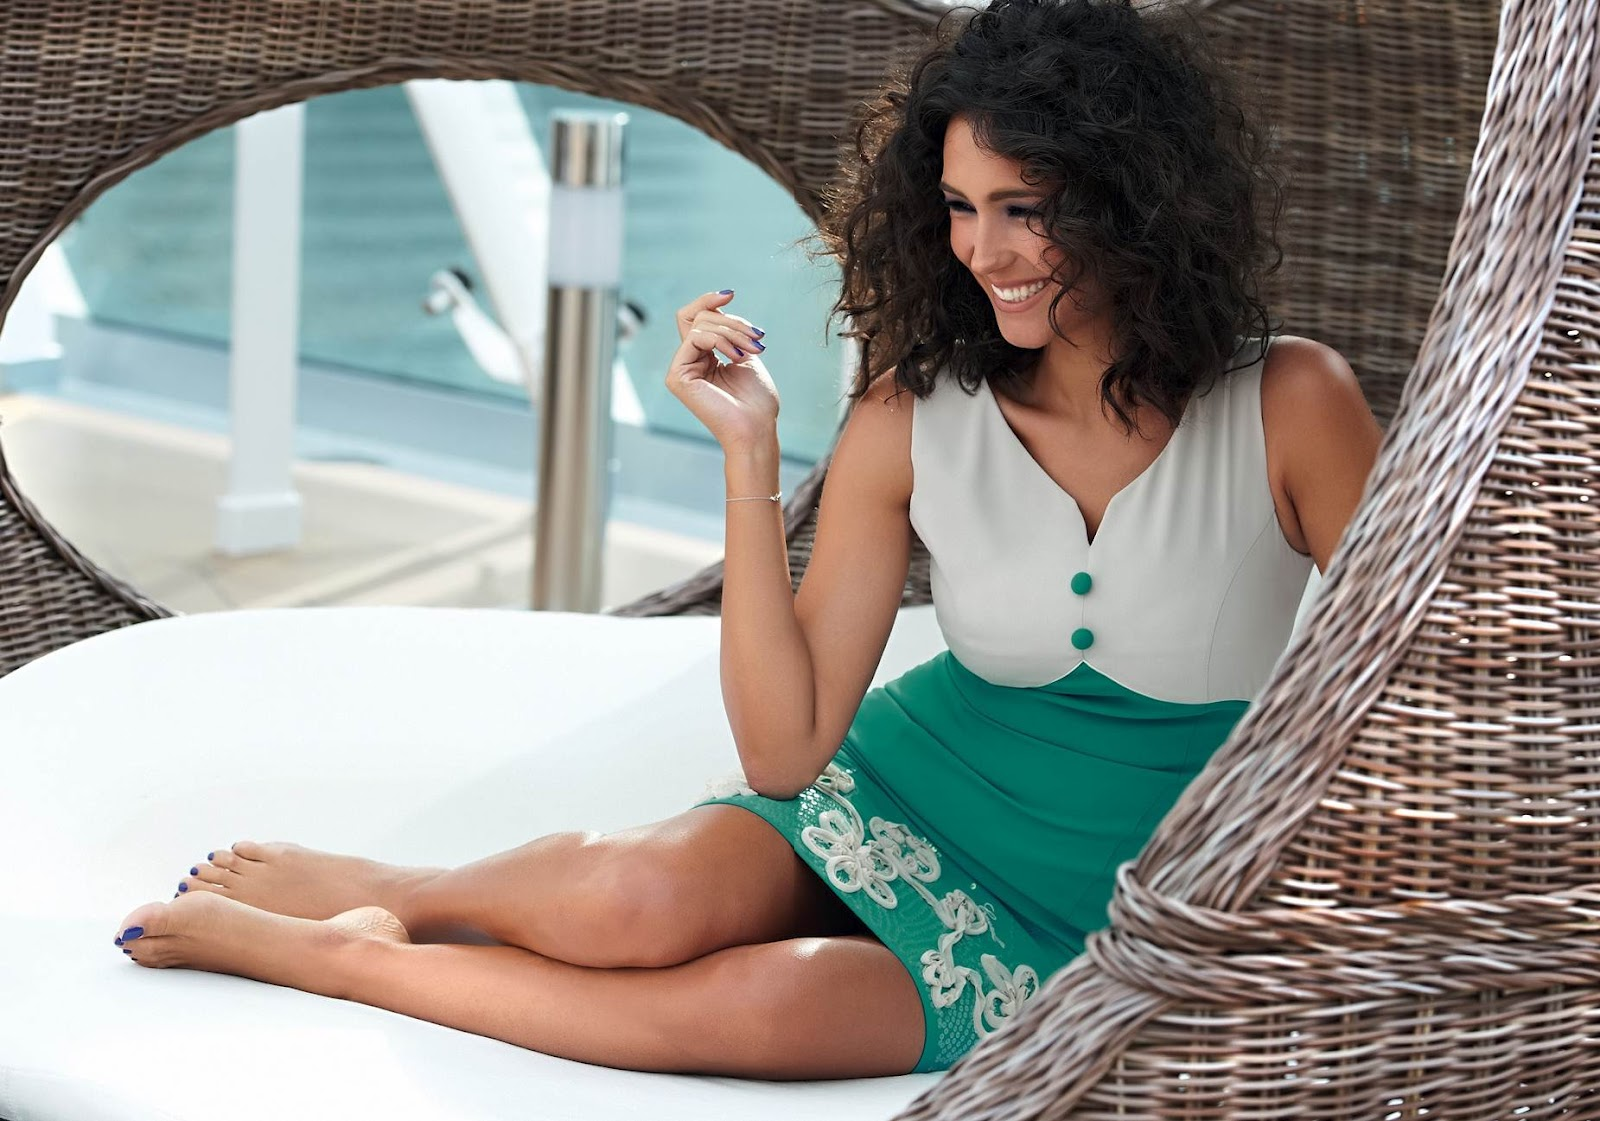 http://3.bp.blogspot.com/-aFwLfIznDck/T3-iefLDxtI/AAAAAAAAAfM/UNru2FJaLEw/s1600/Caterina-Balivo-Feet-638187.jpg